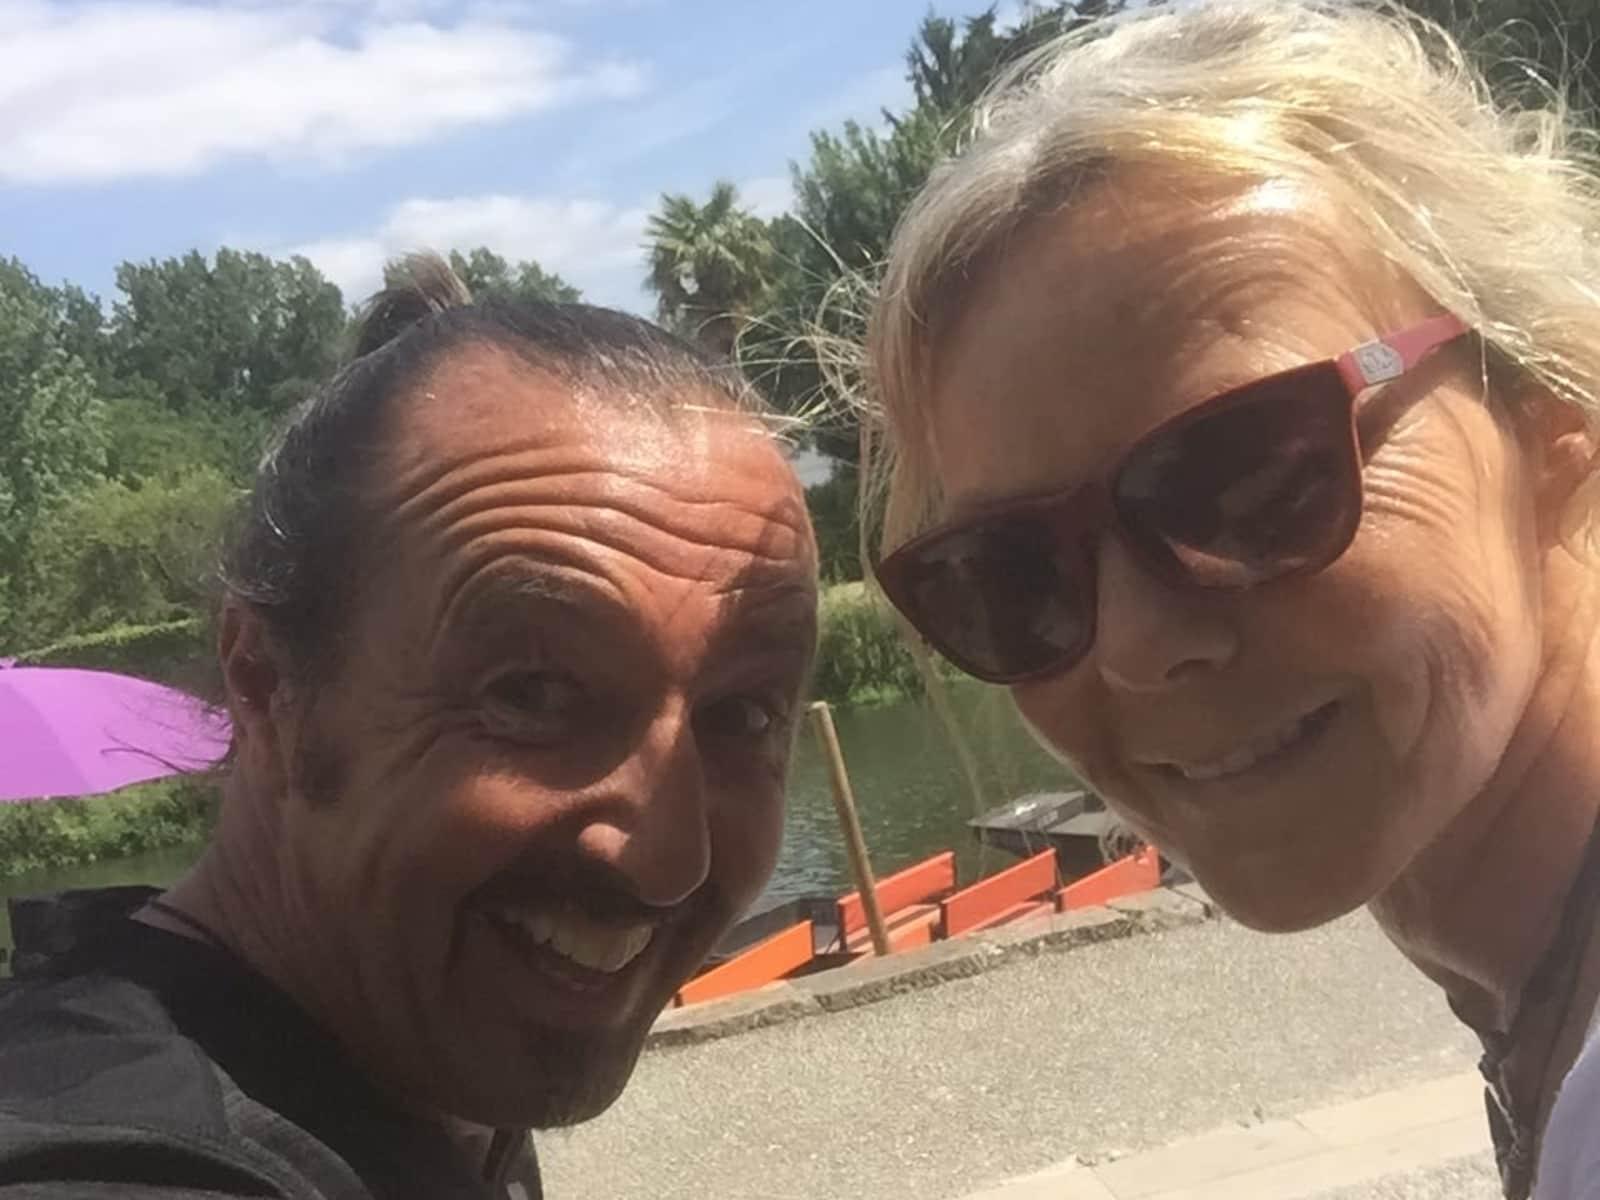 Paul & Bernadette from Darlington, United Kingdom